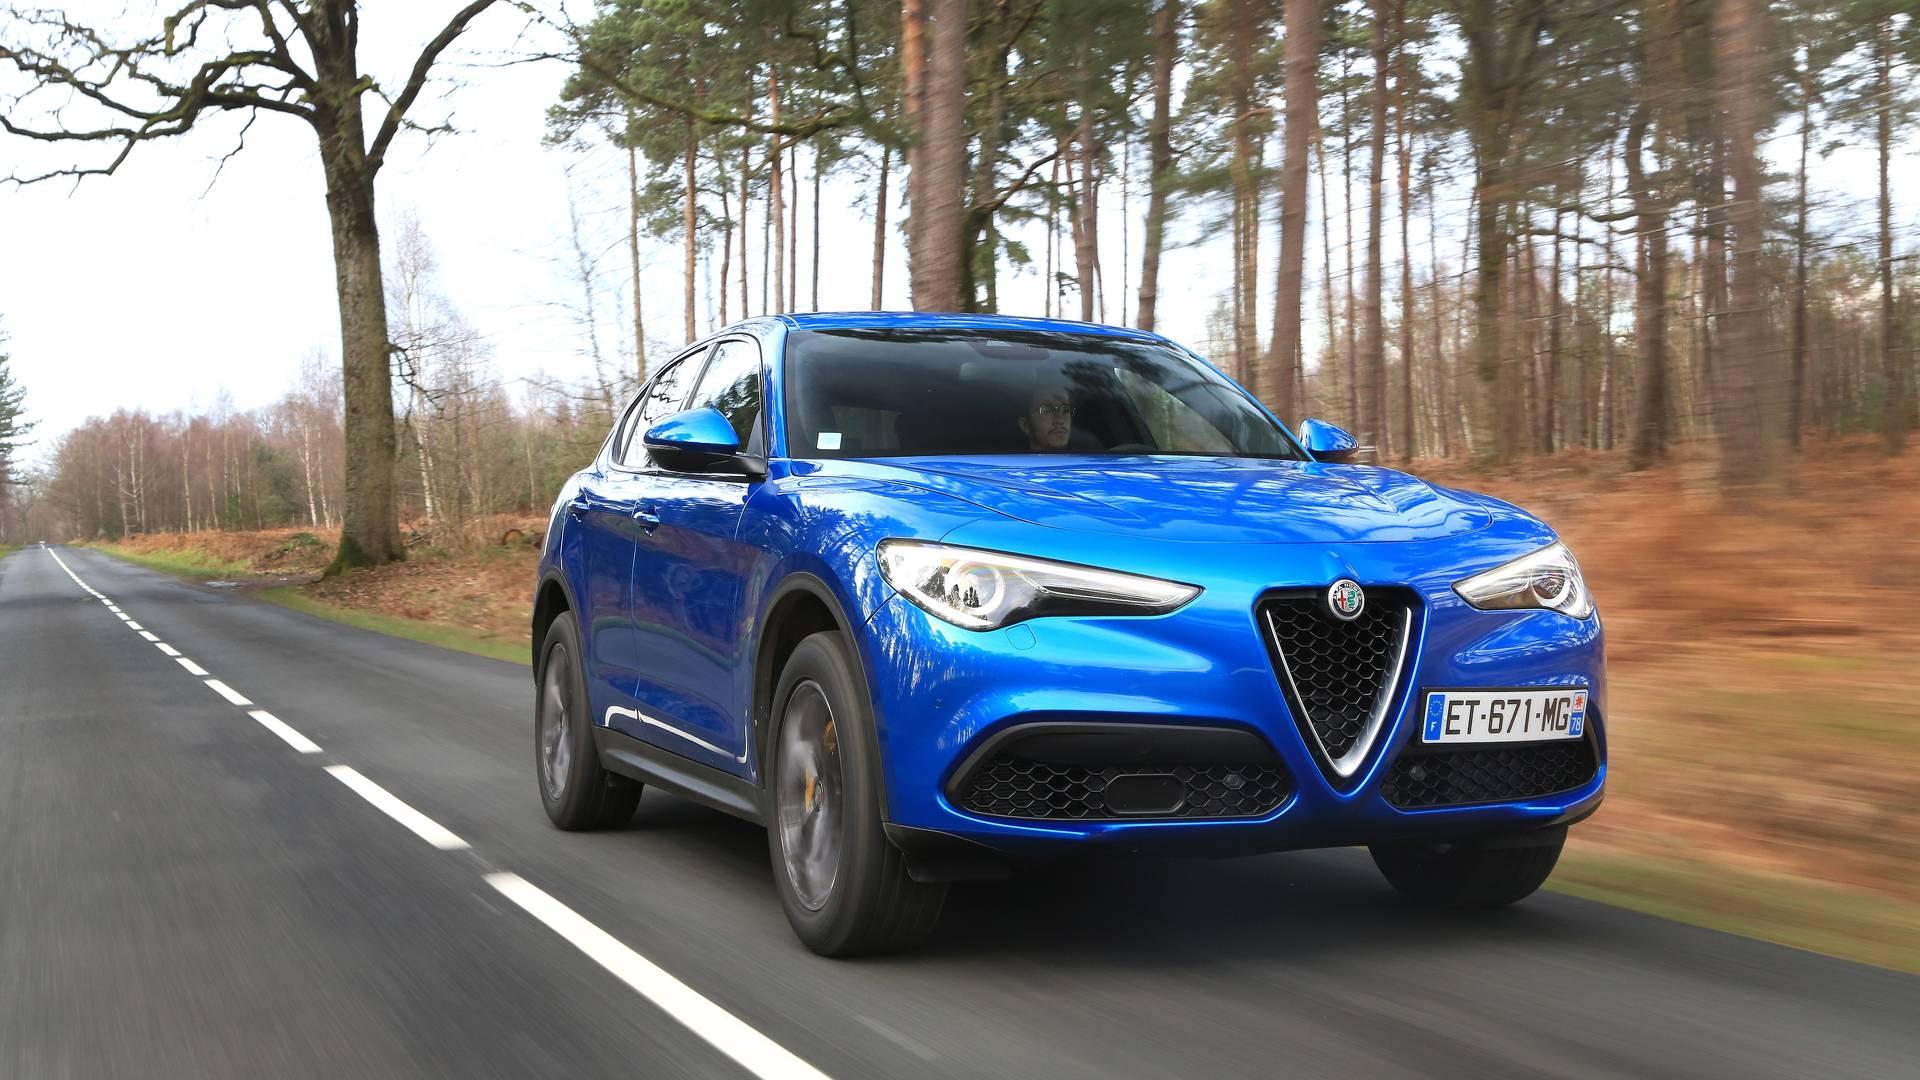 Lalfa Romeo Stelvio Maintenant Disponible En Sport Edition Alfa Modifications